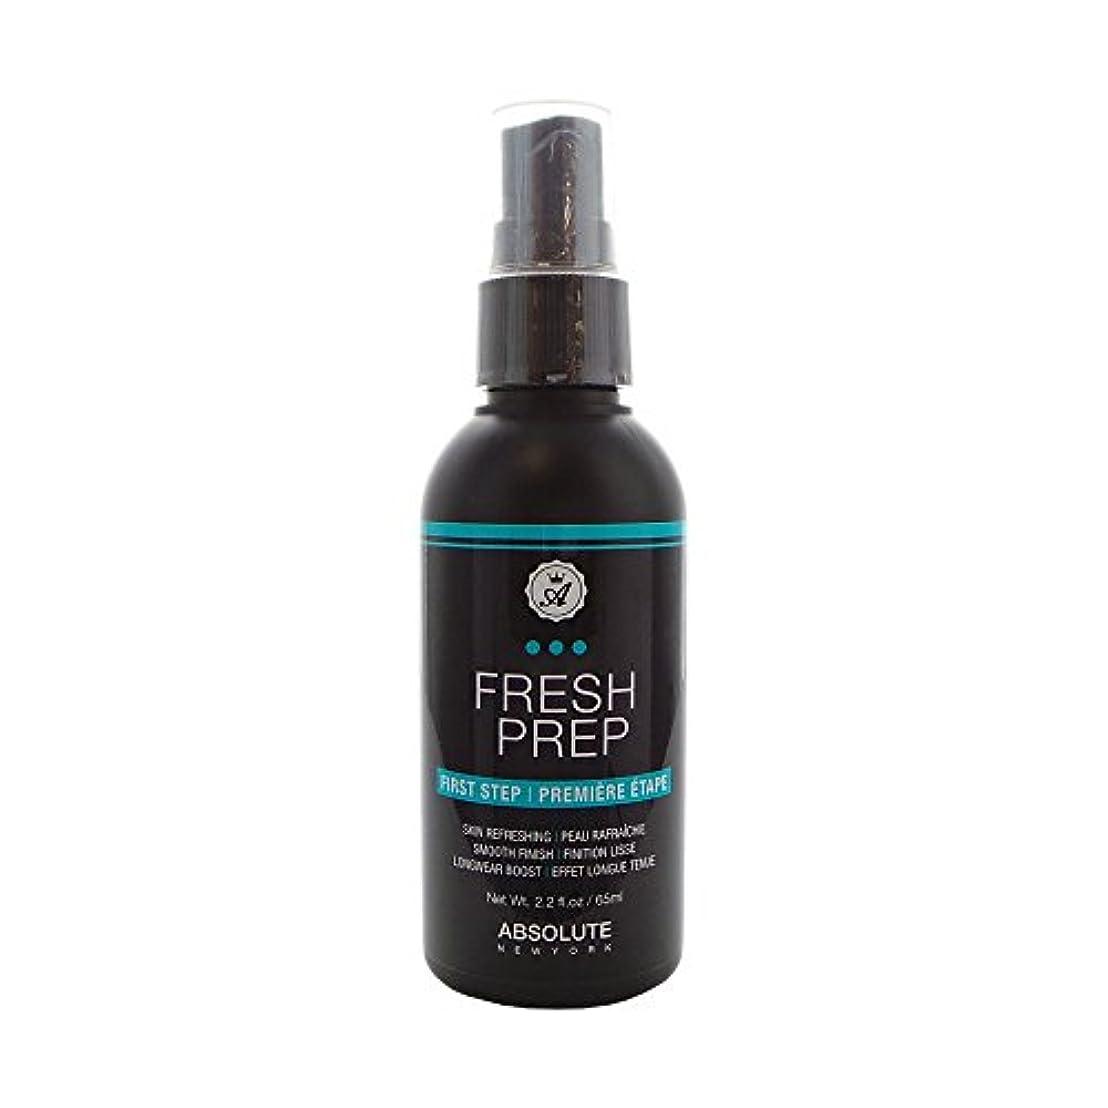 突然委員会ミキサーABSOLUTE Fresh Prep Primer Spray (並行輸入品)